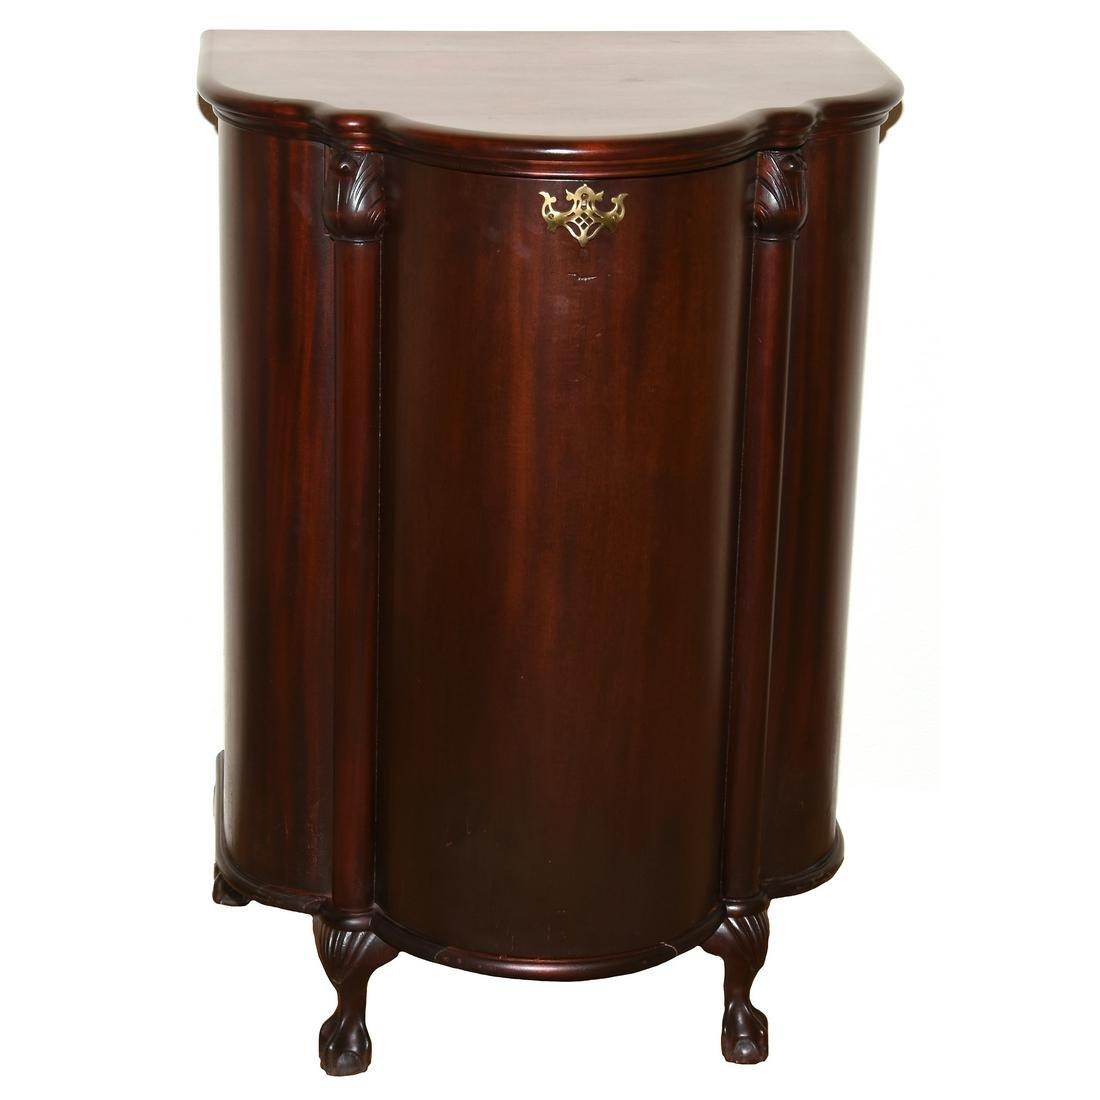 Mahogany Clover Shaped Music Disc Cabinet